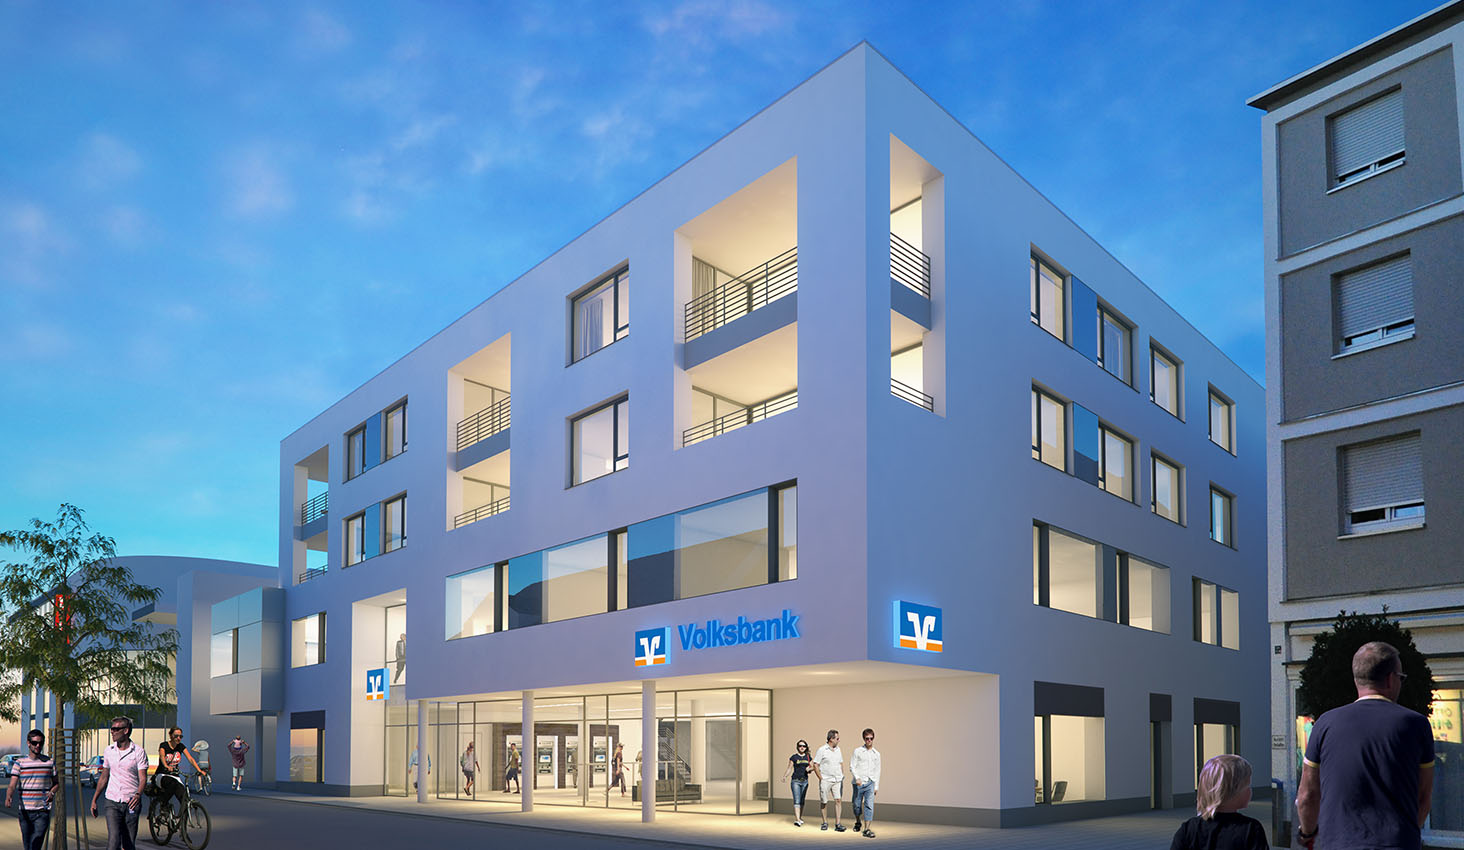 Volksbank Baden Baden Rastatt Bic